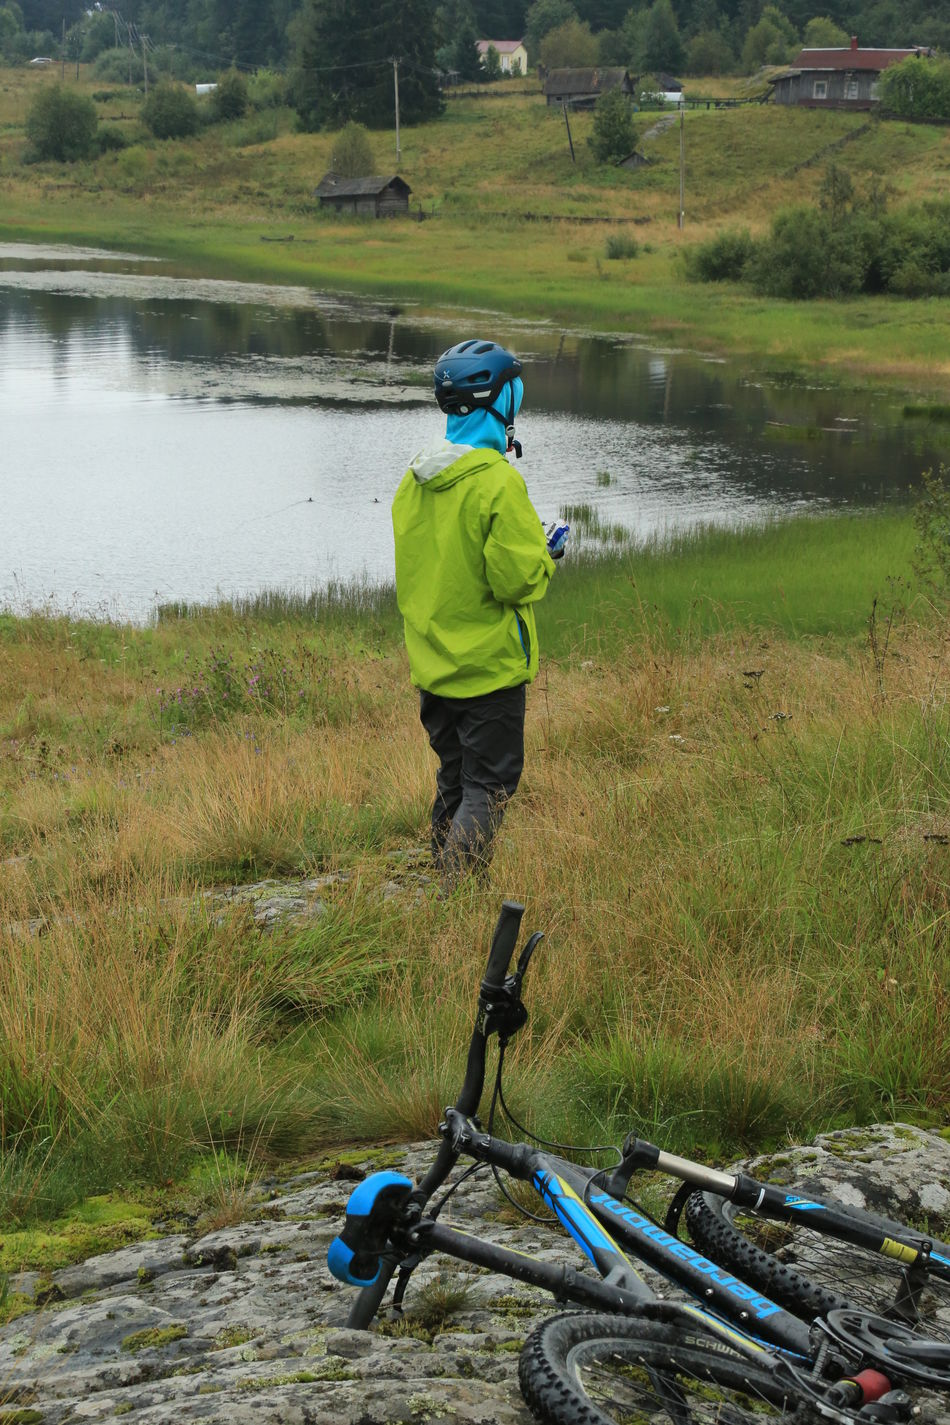 Bycicle Nature Outdoors Tourism Travel велосипед велотур горный катушки Поездка Природа хардтейл